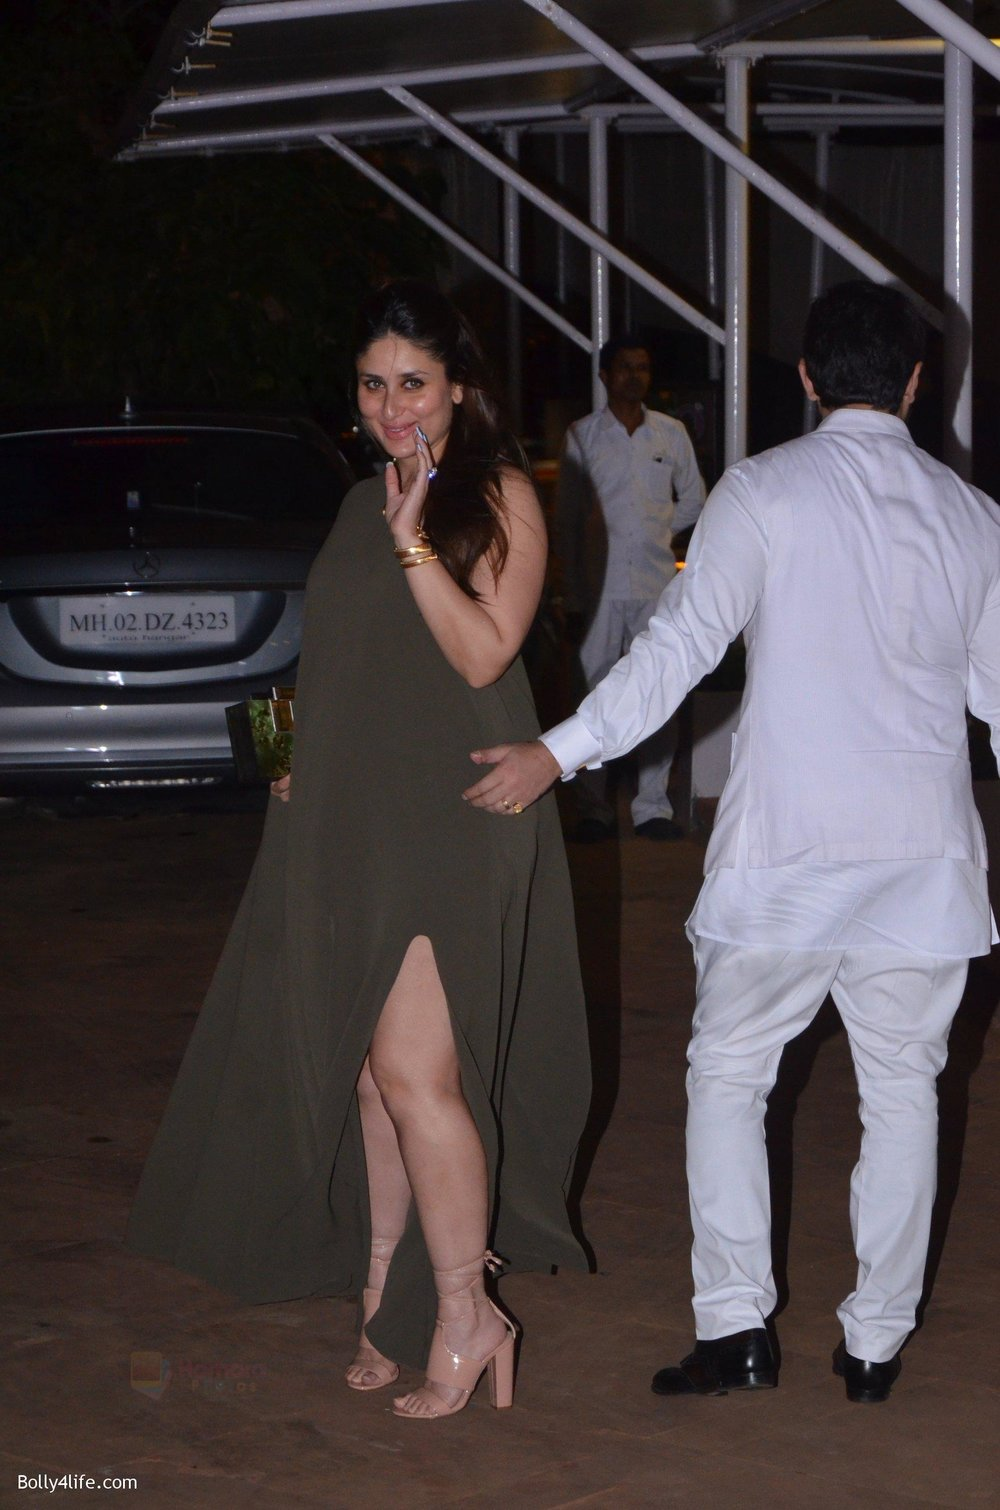 Saif-Ali-Khan-Kareena-Kapoor-at-Reema-jain-bday-party-in-Amadeus-NCPA-on-28th-Sept-2016-877.jpg